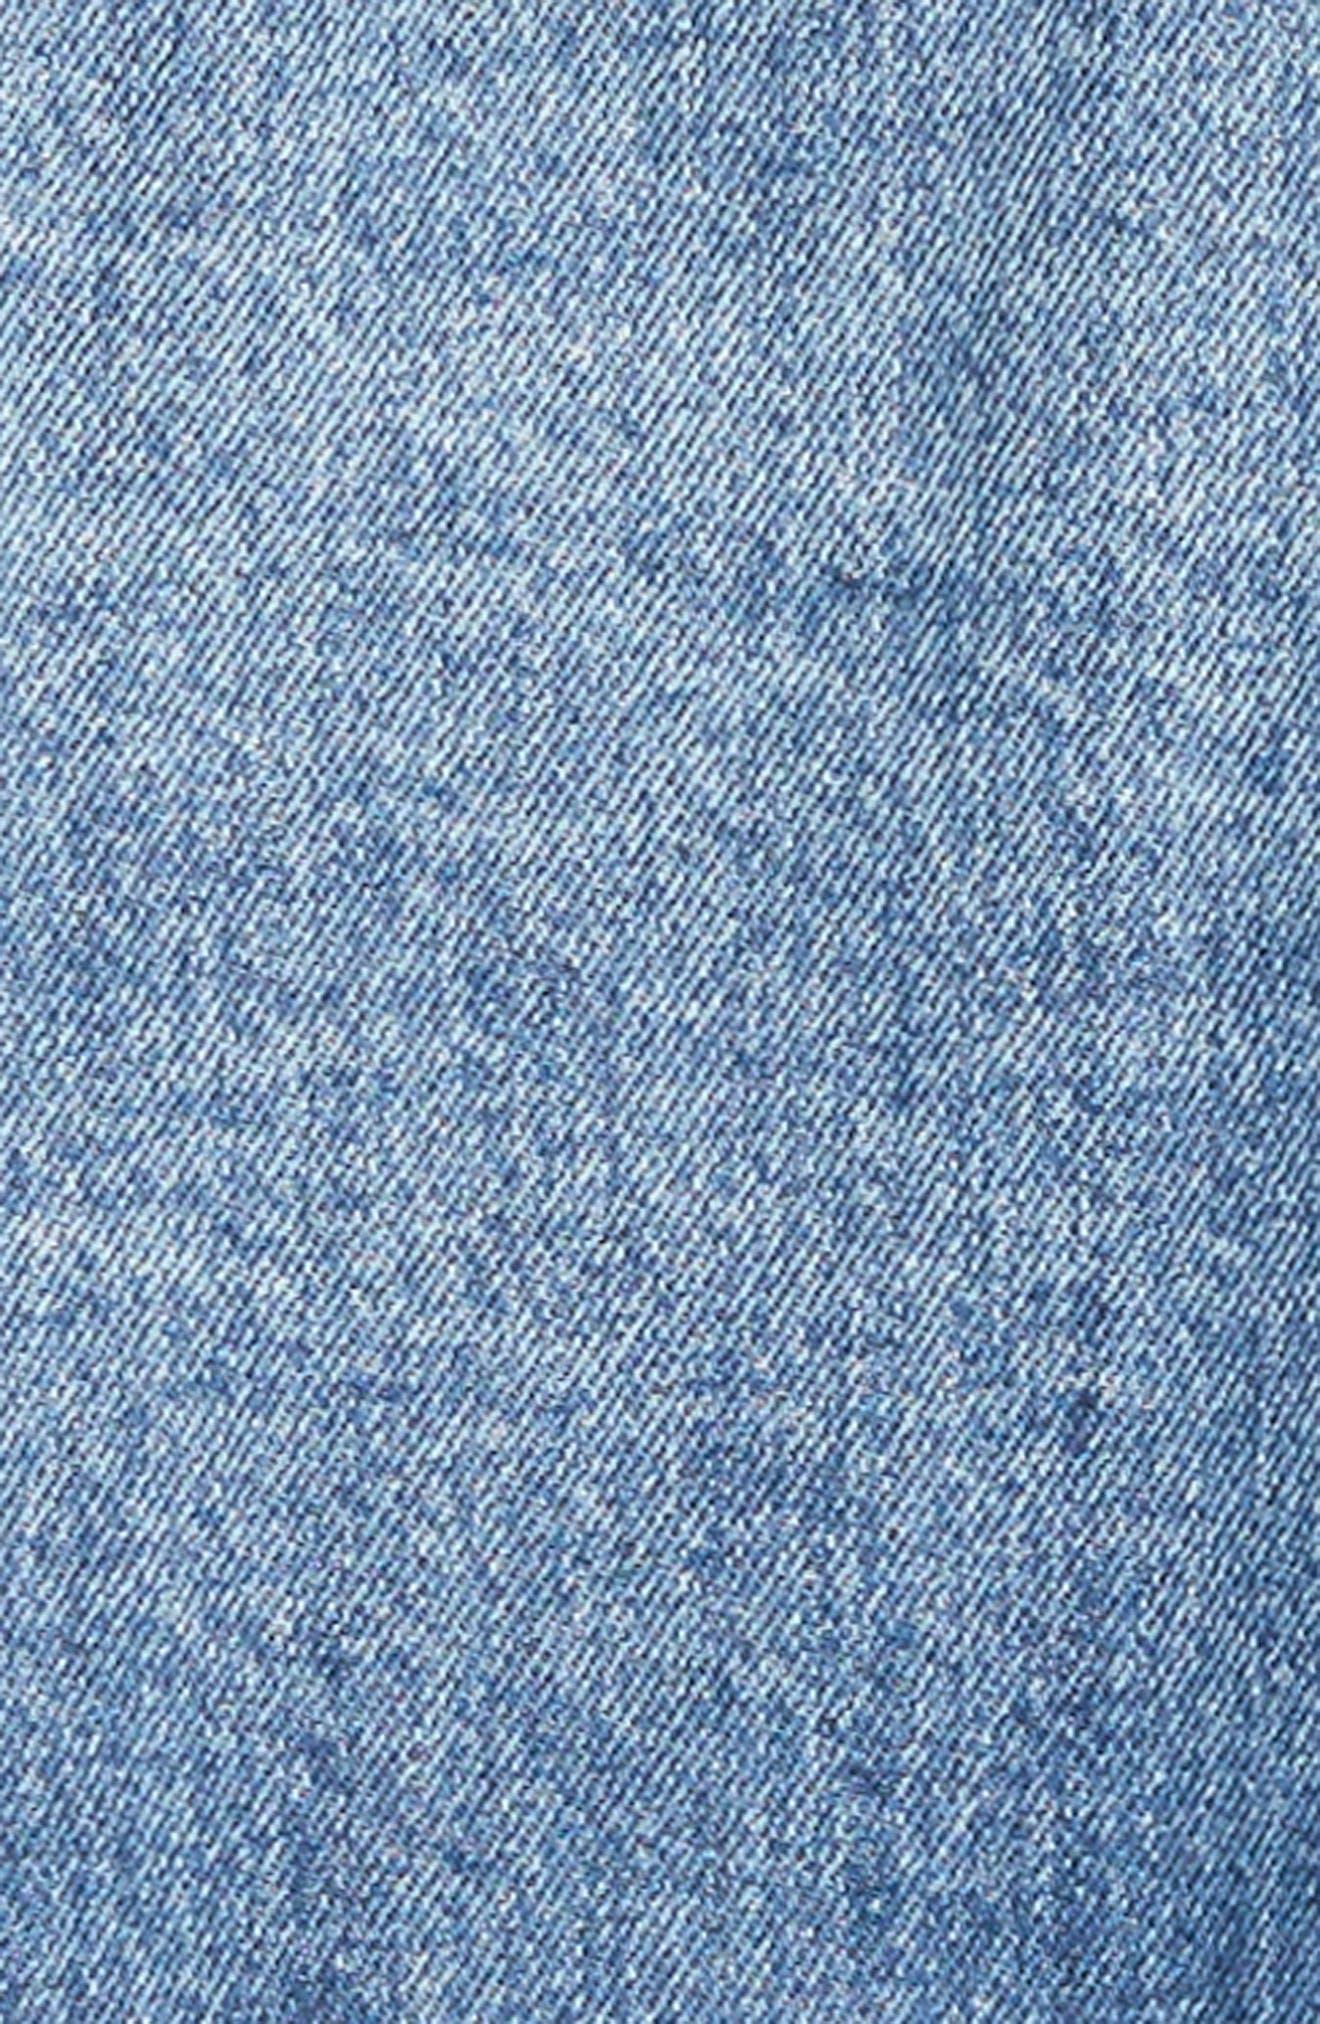 Kremi Crop Denim Jacket,                             Alternate thumbnail 5, color,                             400